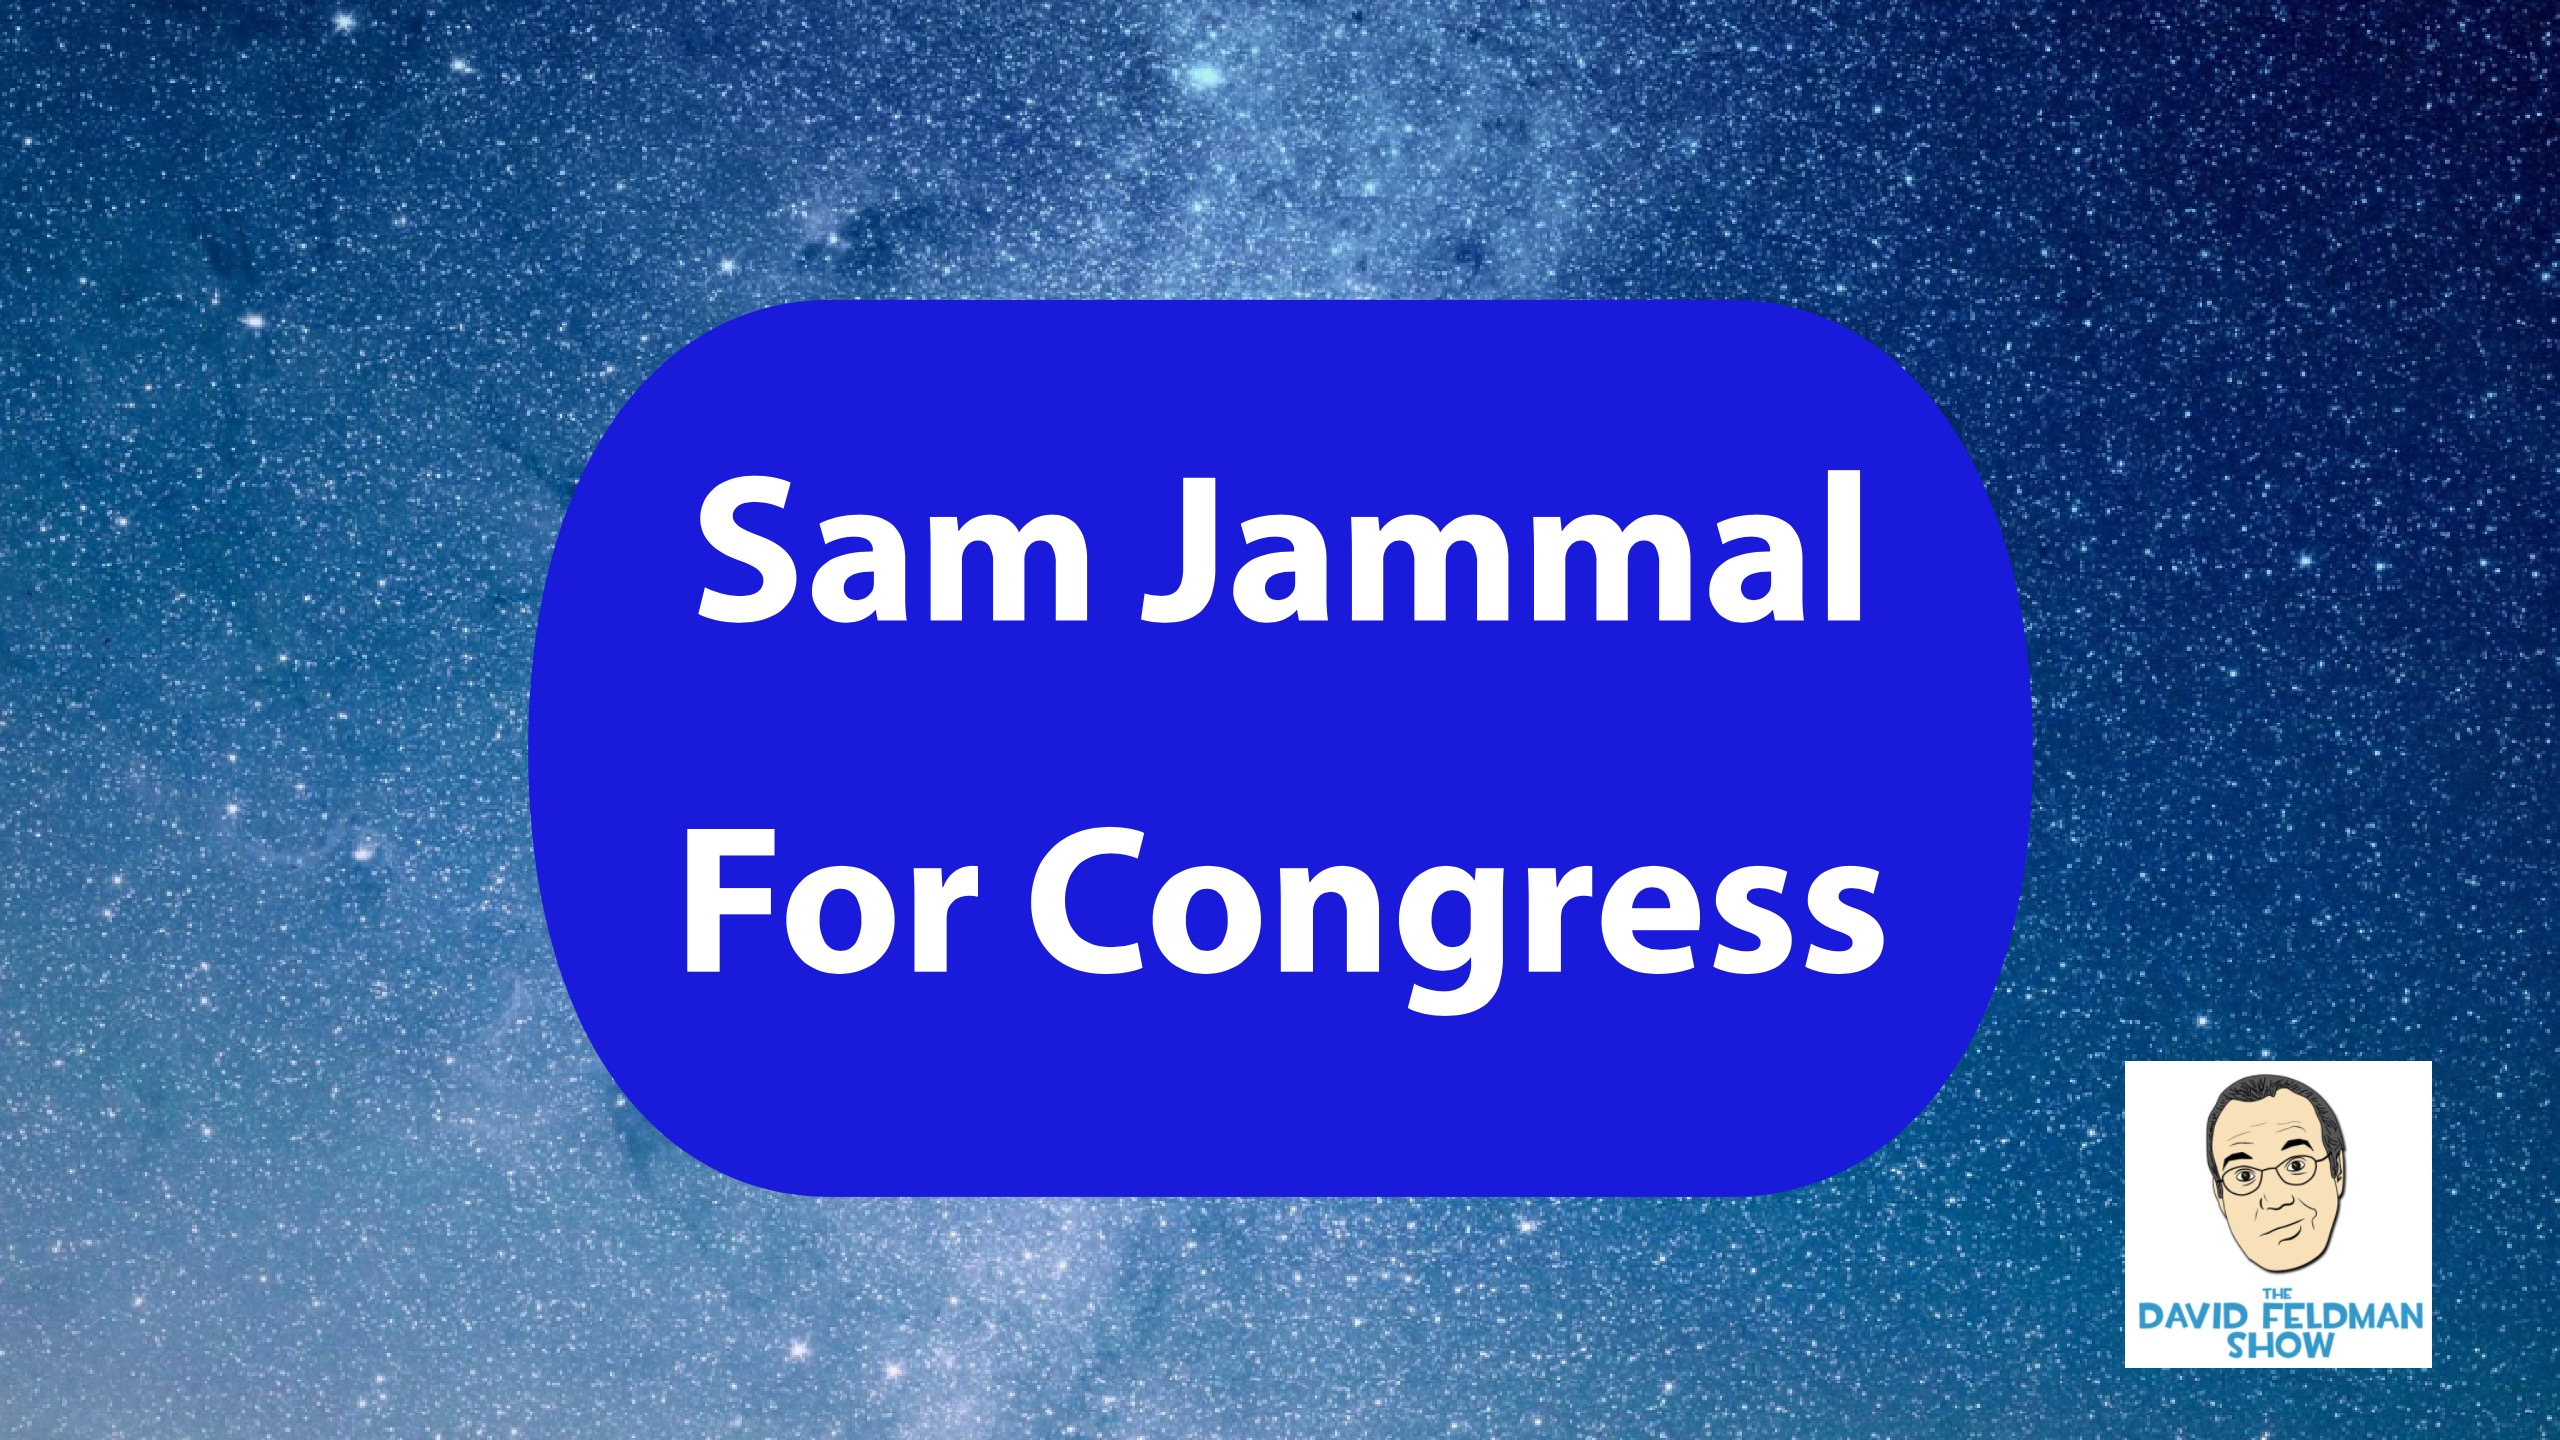 Sam jammal for congress